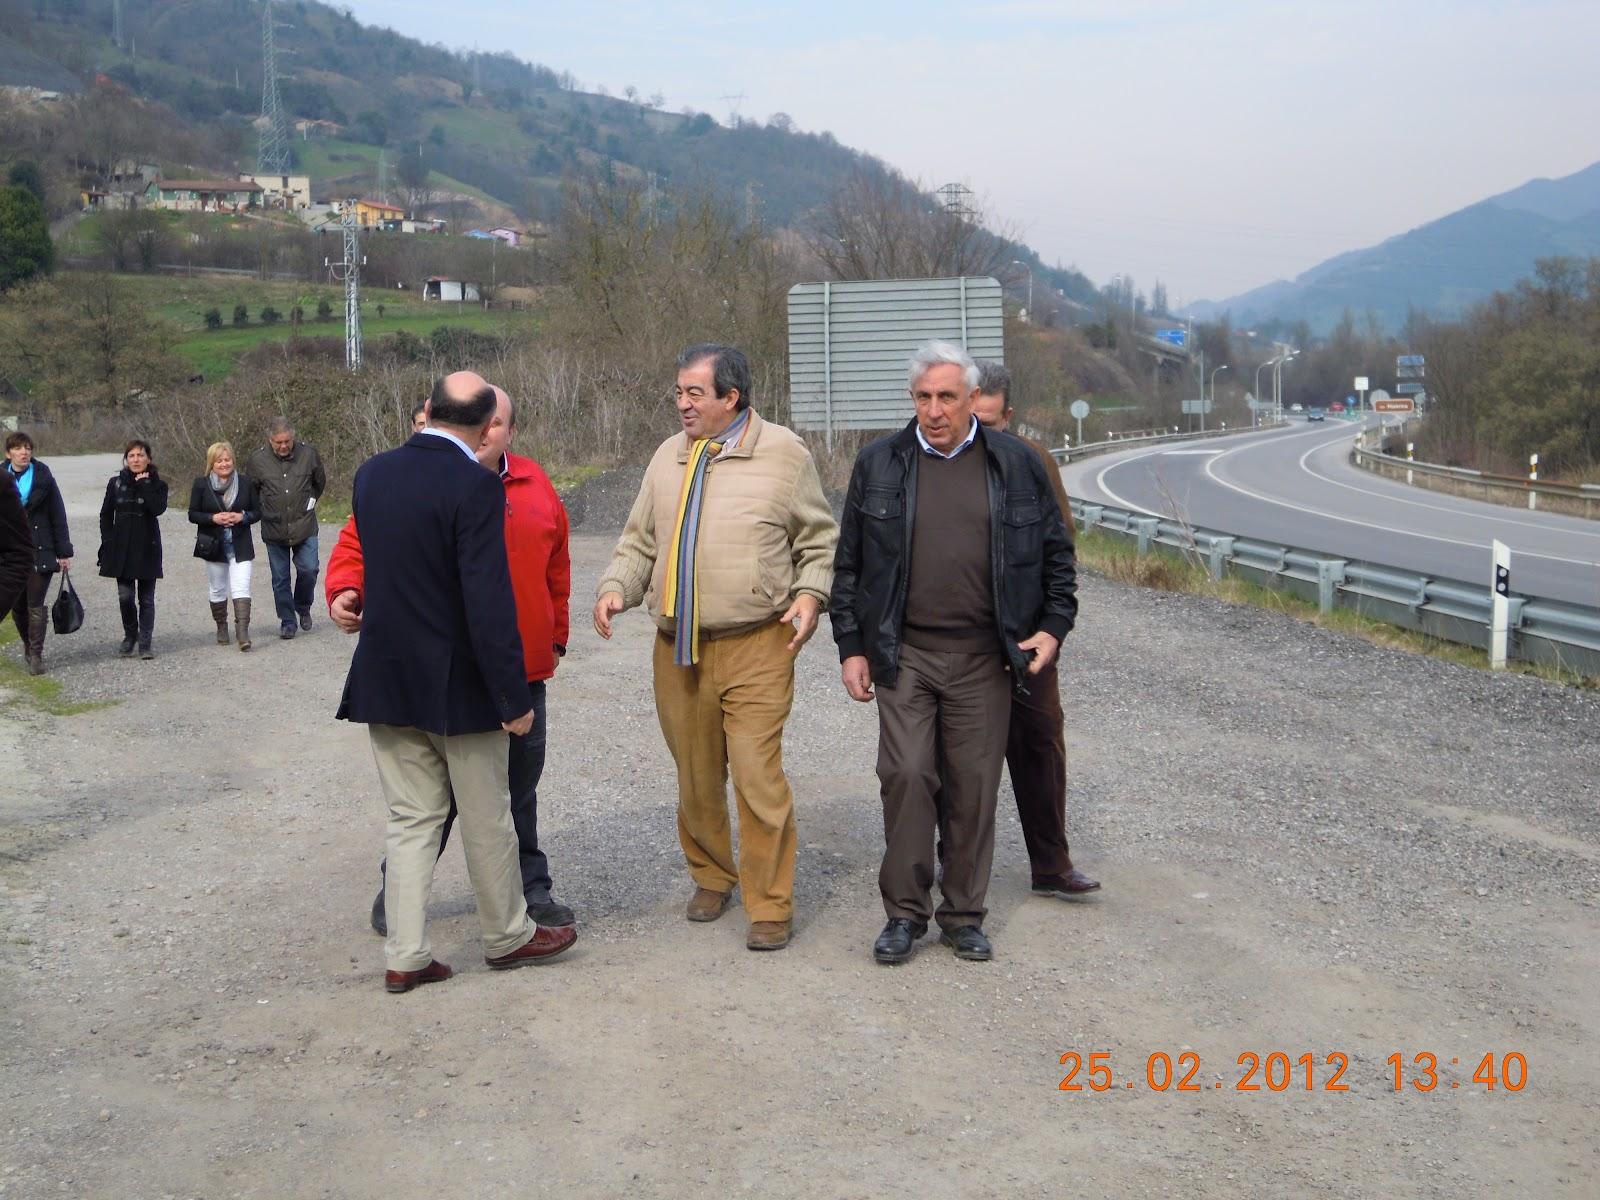 Foro asturias lena francisco alvarez cascos en campomanes for Foro chimeneas de lena